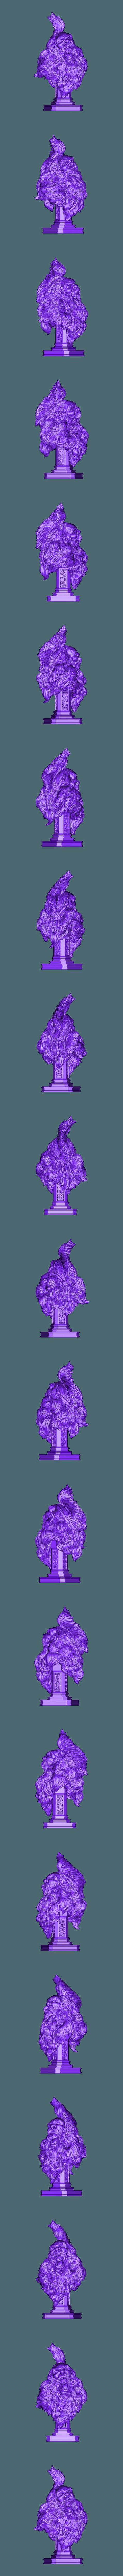 BeardedYell_Mid_372k.stl Download free STL file The Bearded Yell • 3D printable object, bendansie